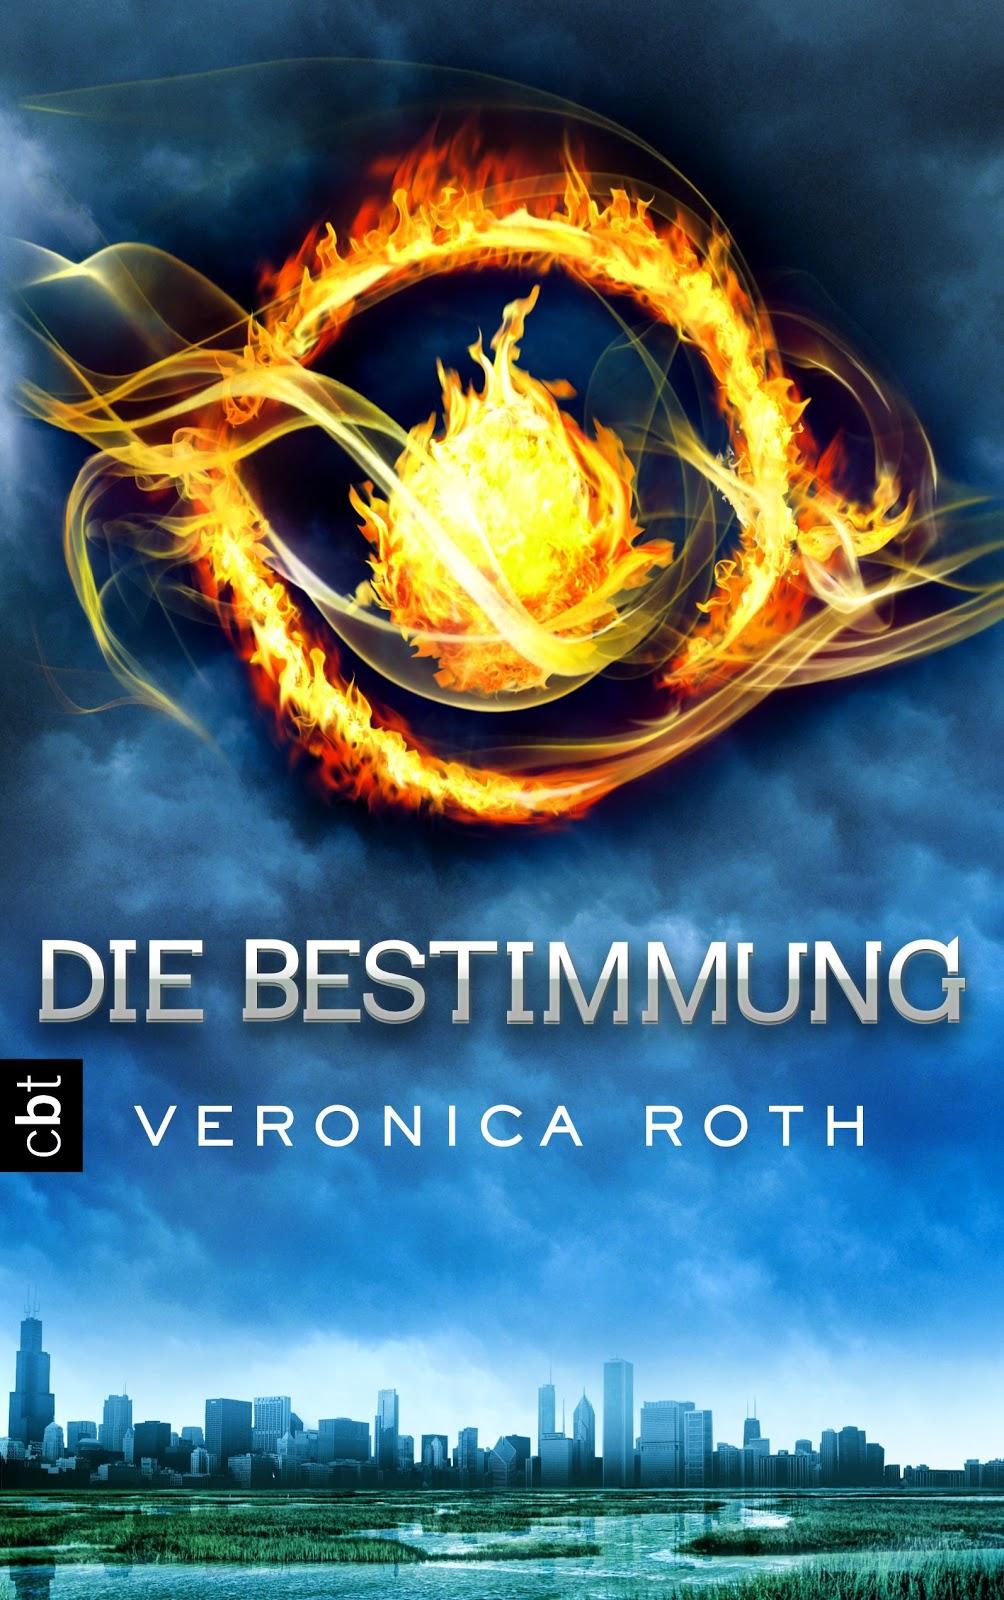 http://www.randomhouse.de/content/edition/covervoila_hires/Roth_VDie_Bestimmung_01_120566.jpg